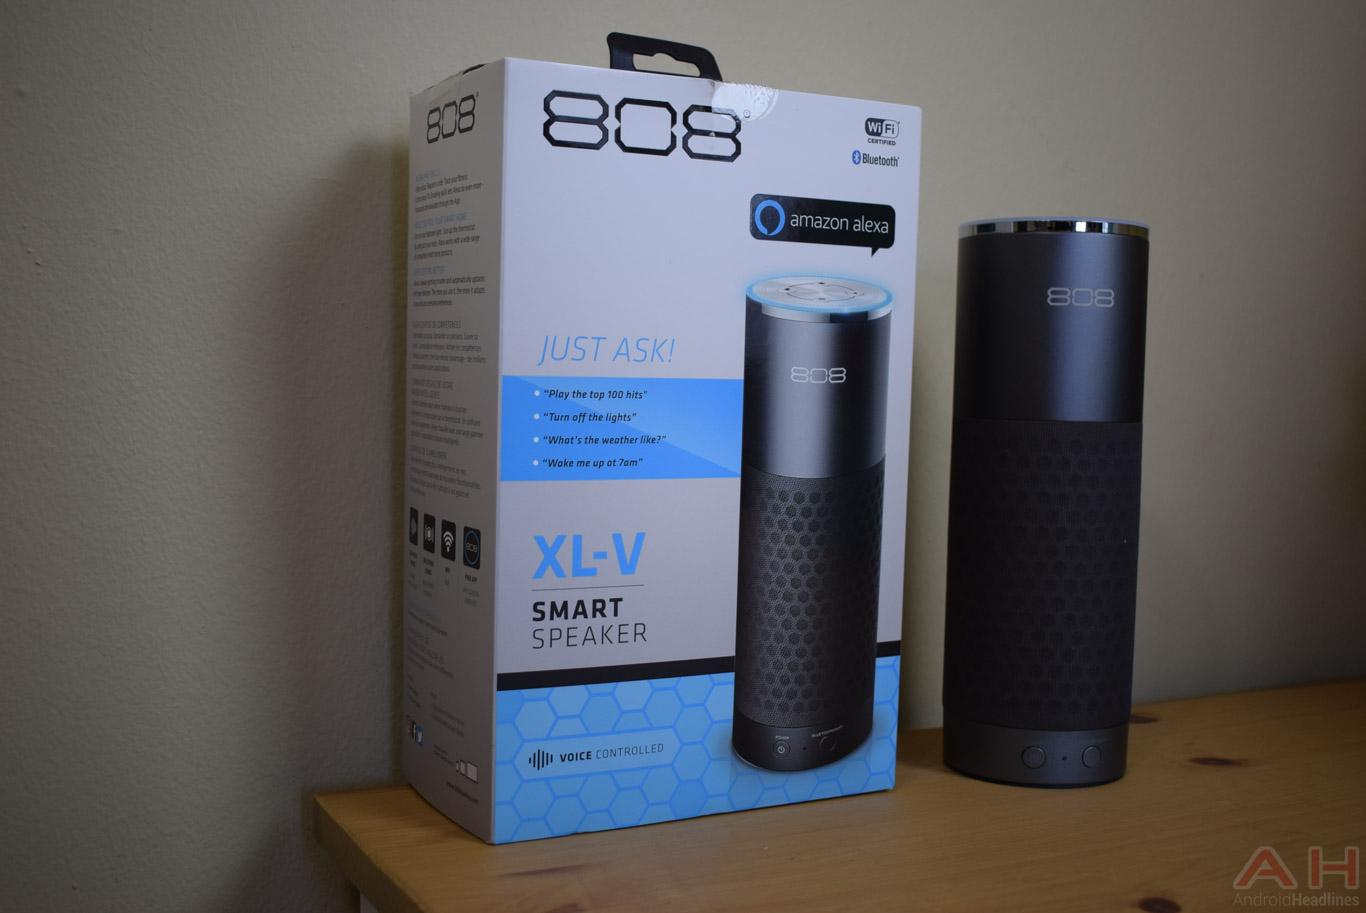 808 Audio XL-V Smart Speaker with Amazon Alexa Review